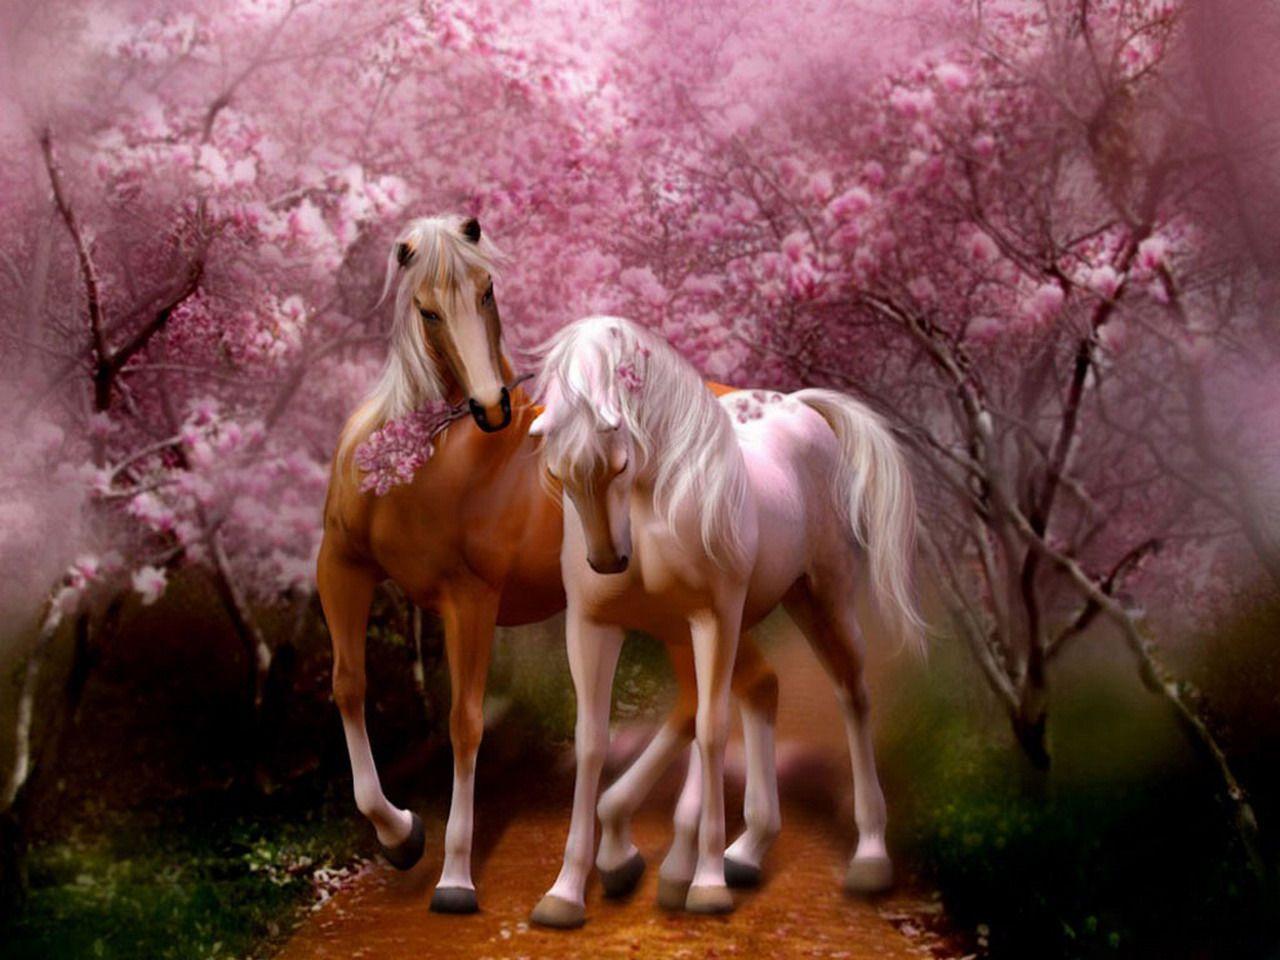 Cool Wallpaper Horse Spring - d4abd2c5e2994e2f378cee2f47d7ebd4  You Should Have_854848.jpg